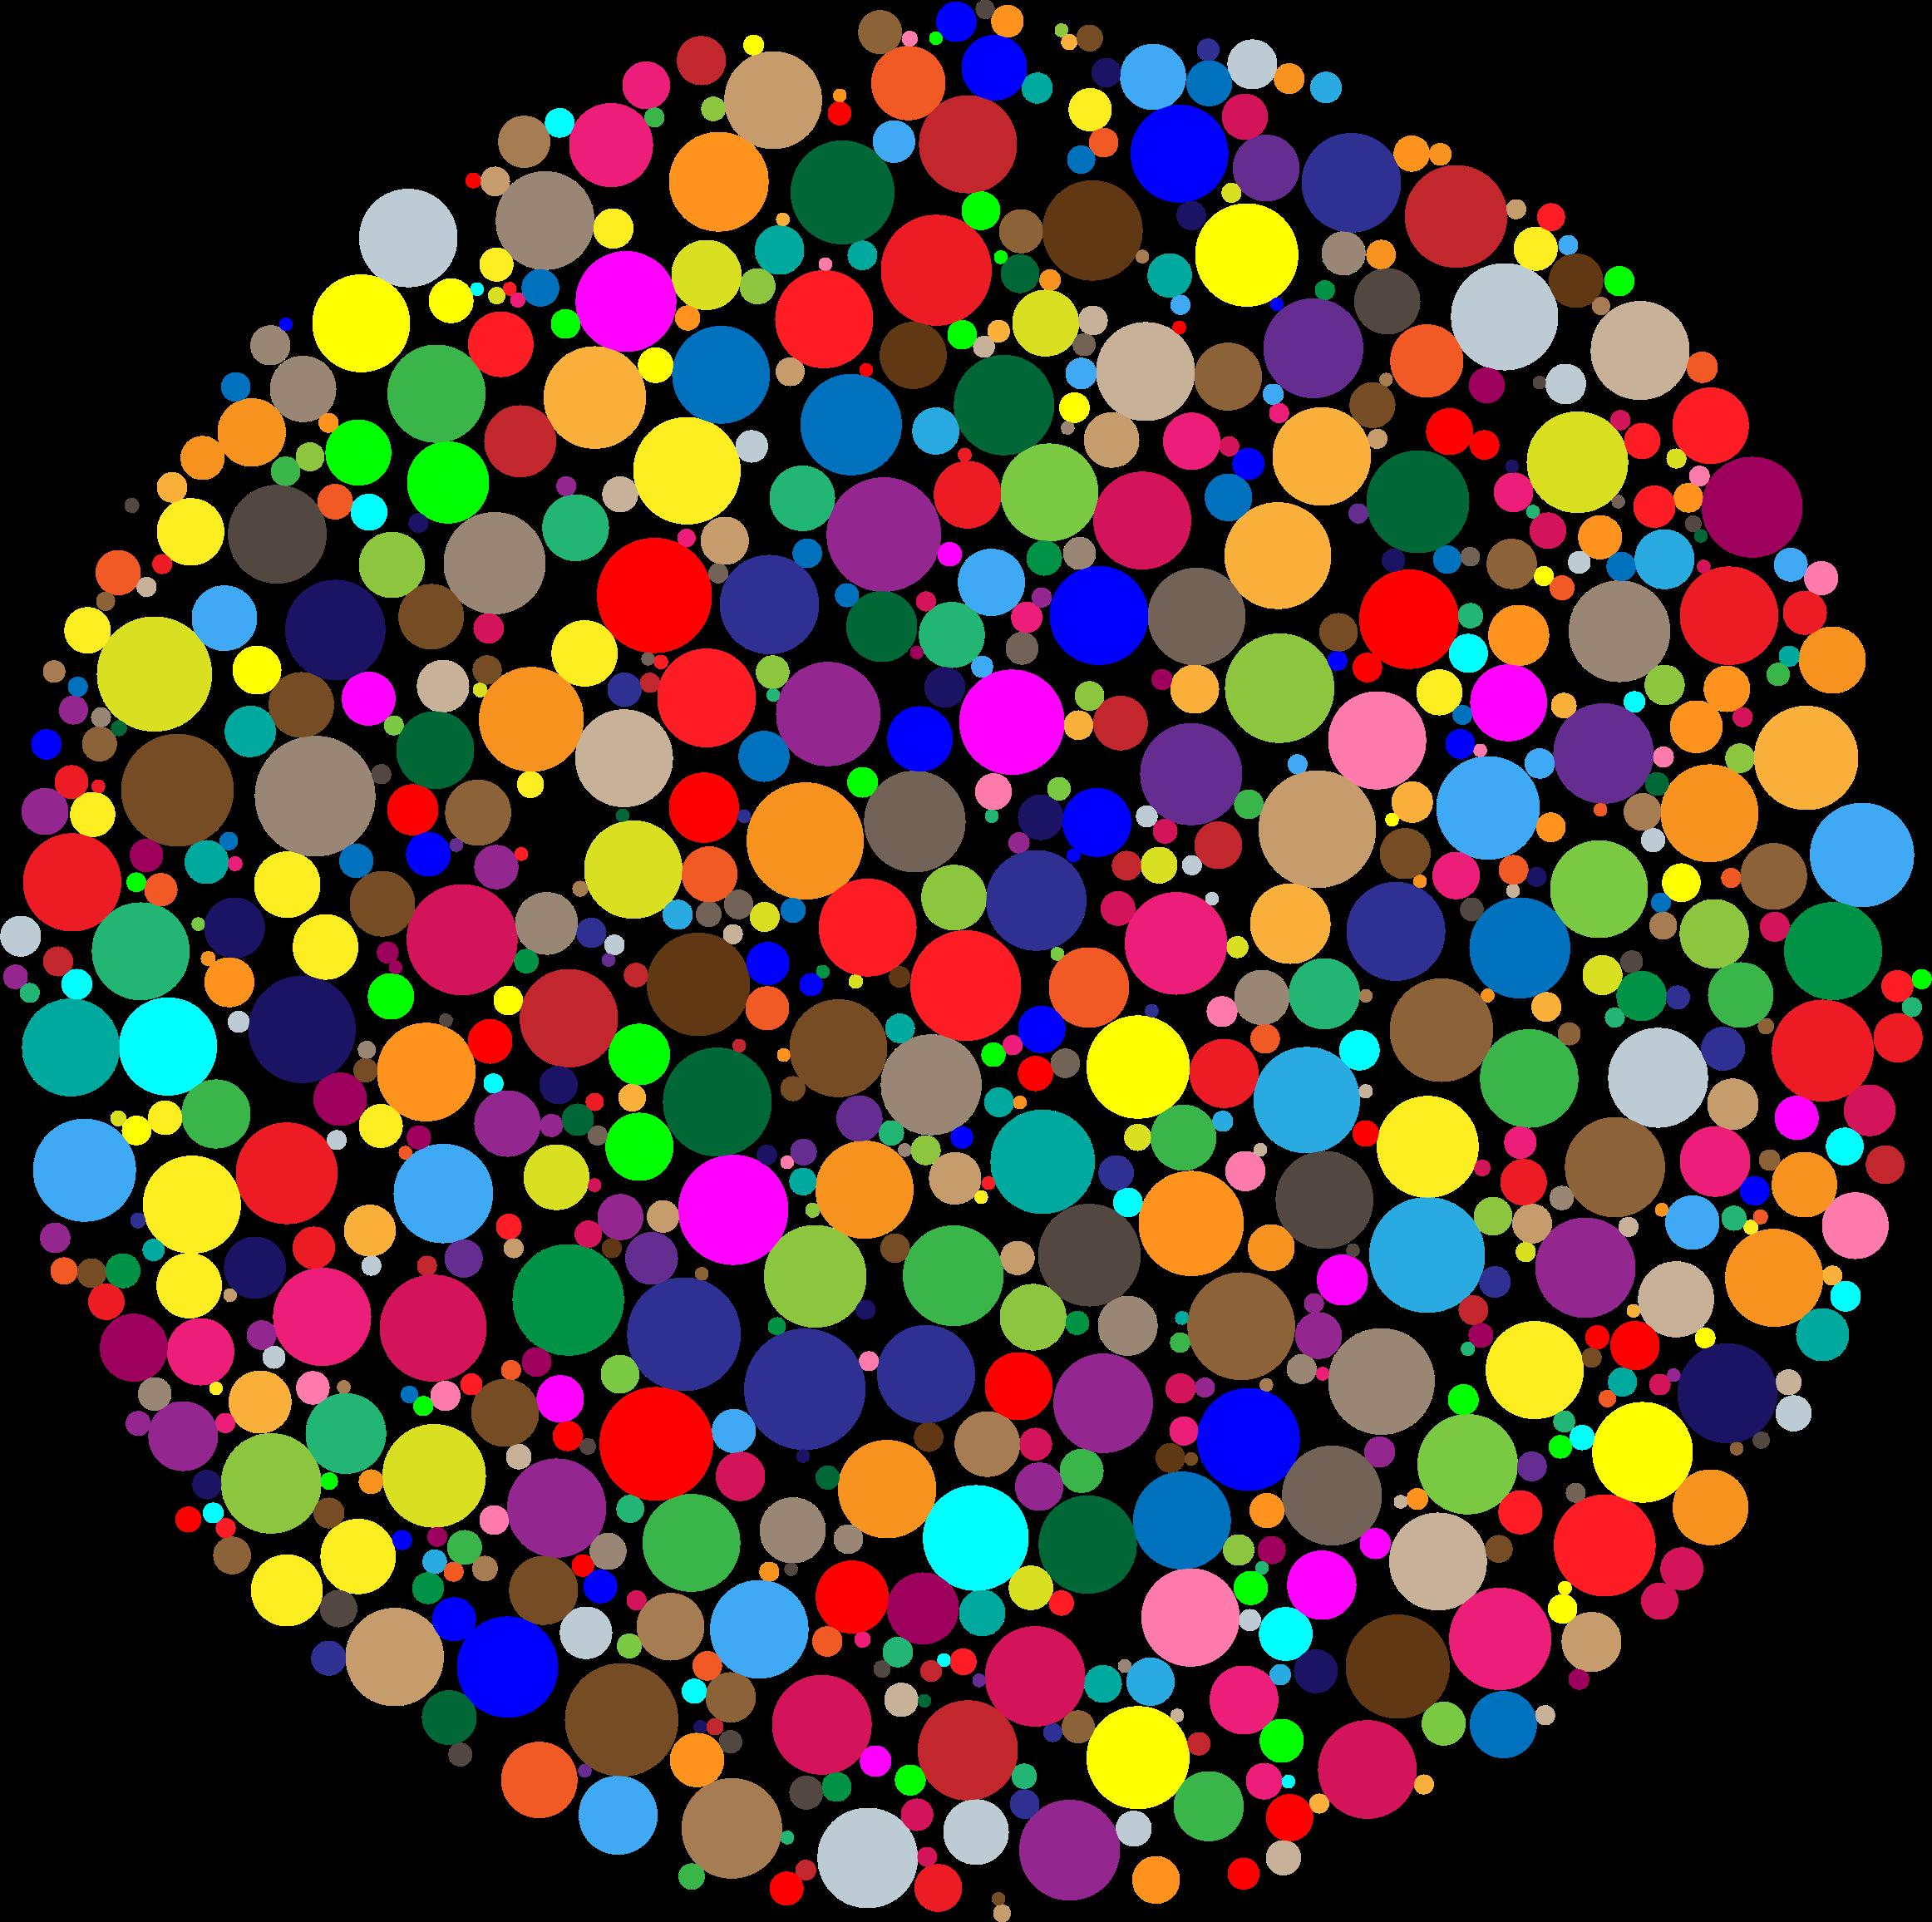 Colorful circle big image. France clipart fractal